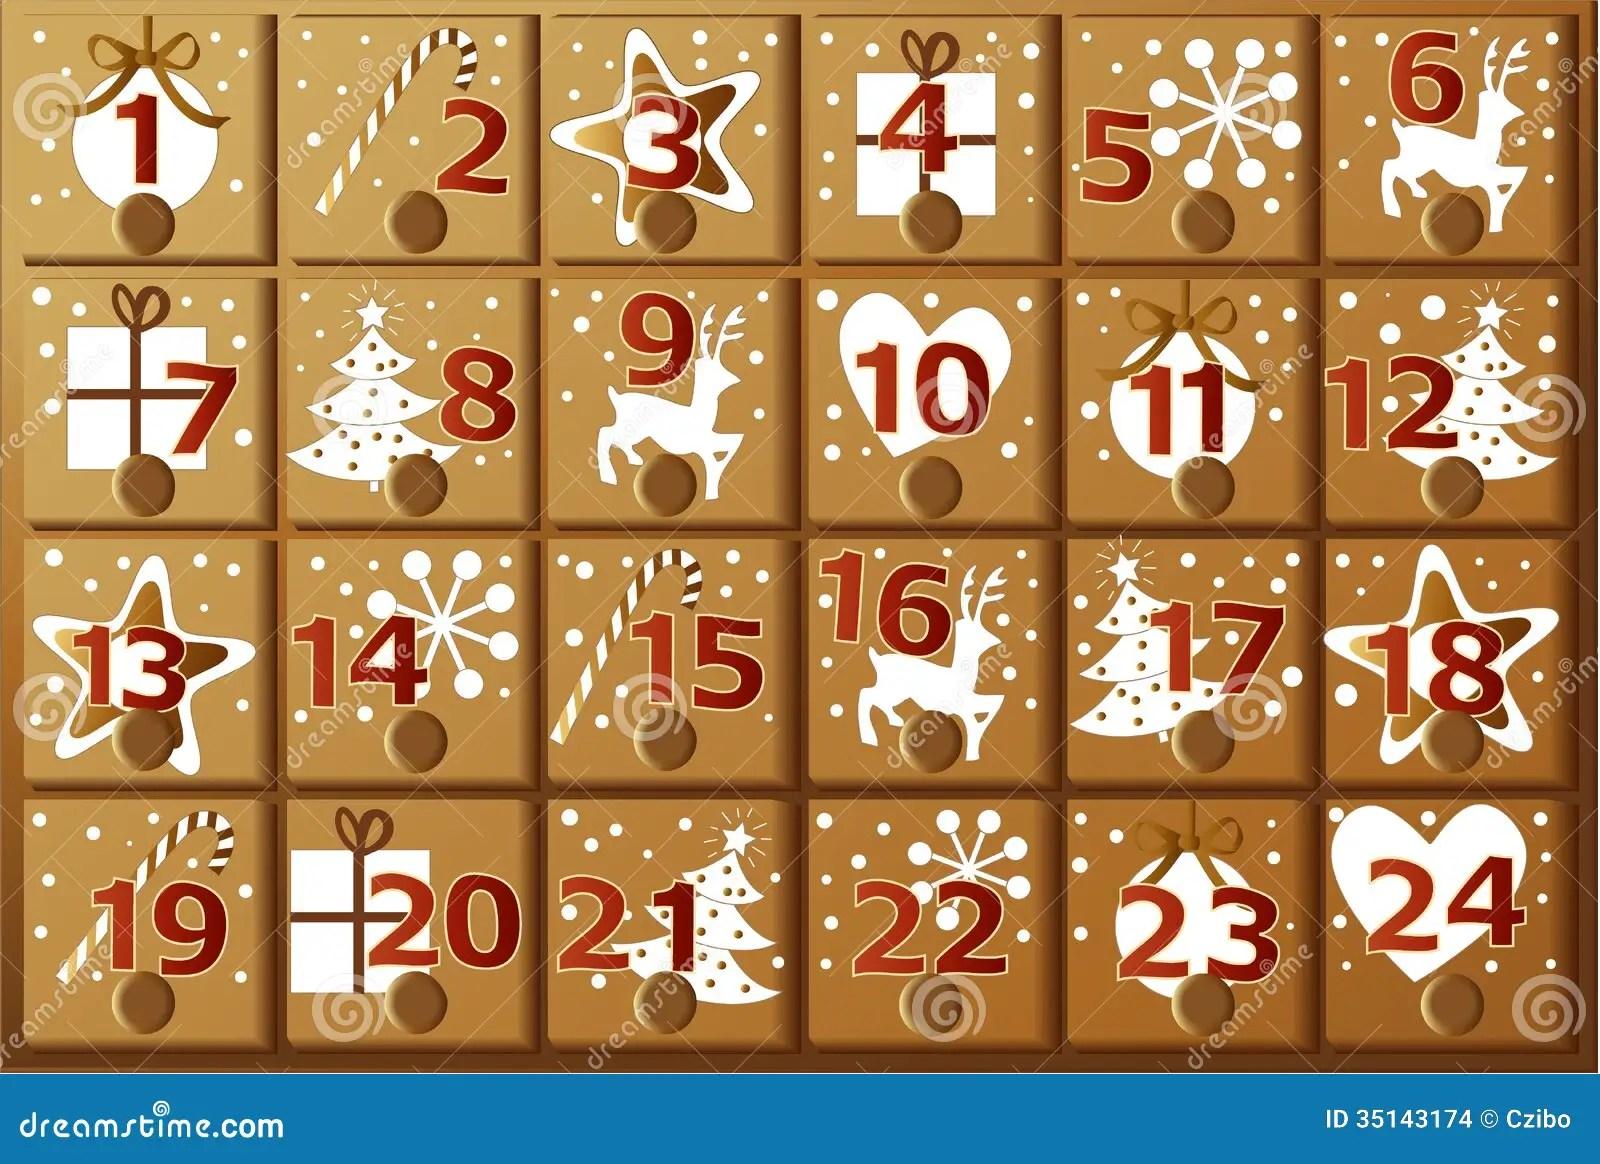 Online Advent Calendars Printable | Calendar Template 2016